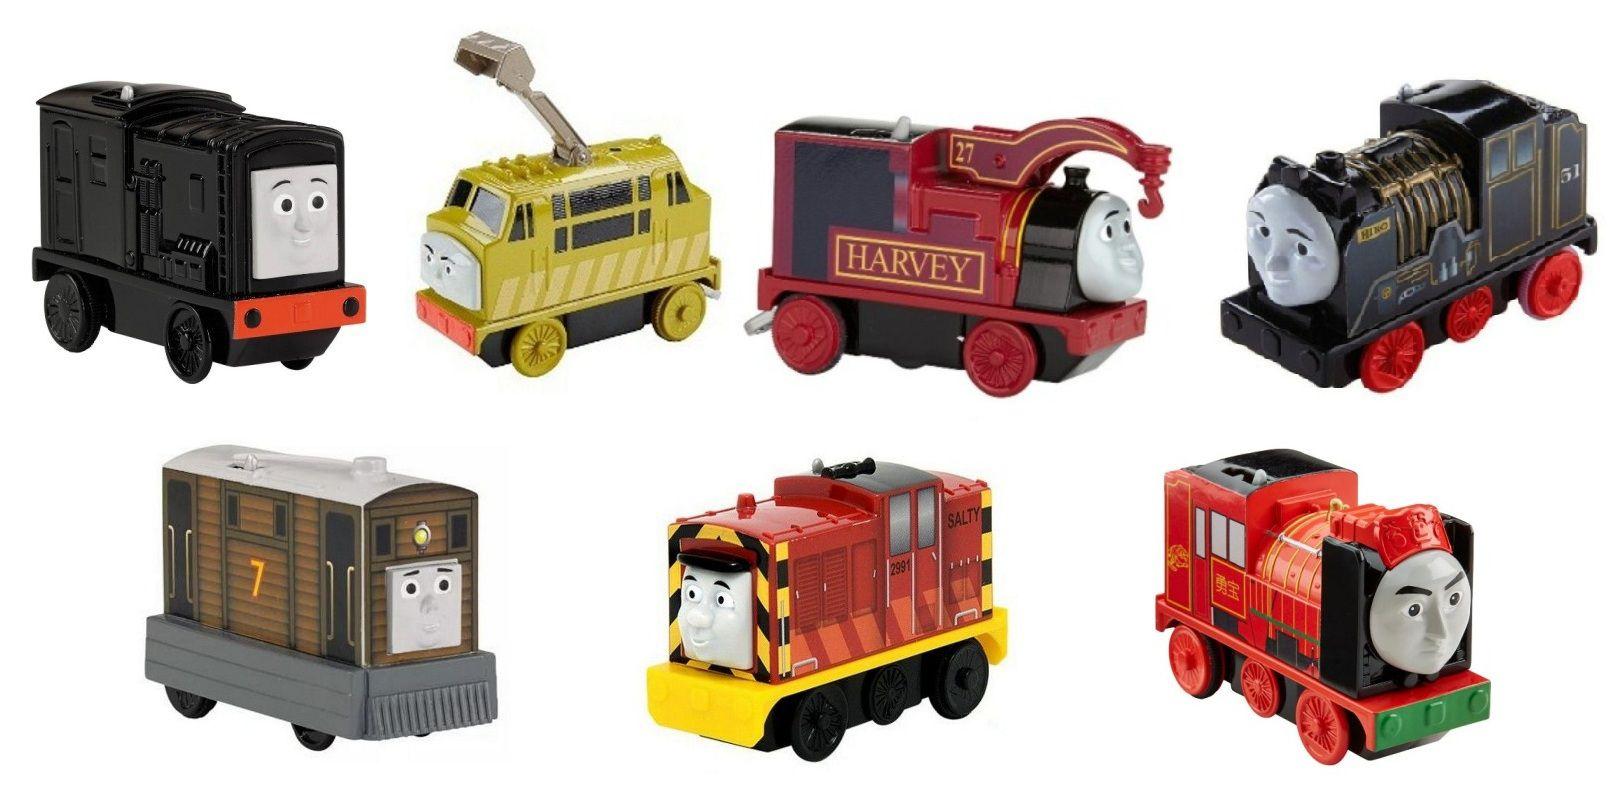 Locomotiva Thomas & Friends Ação Motorizada - Fisher-Price